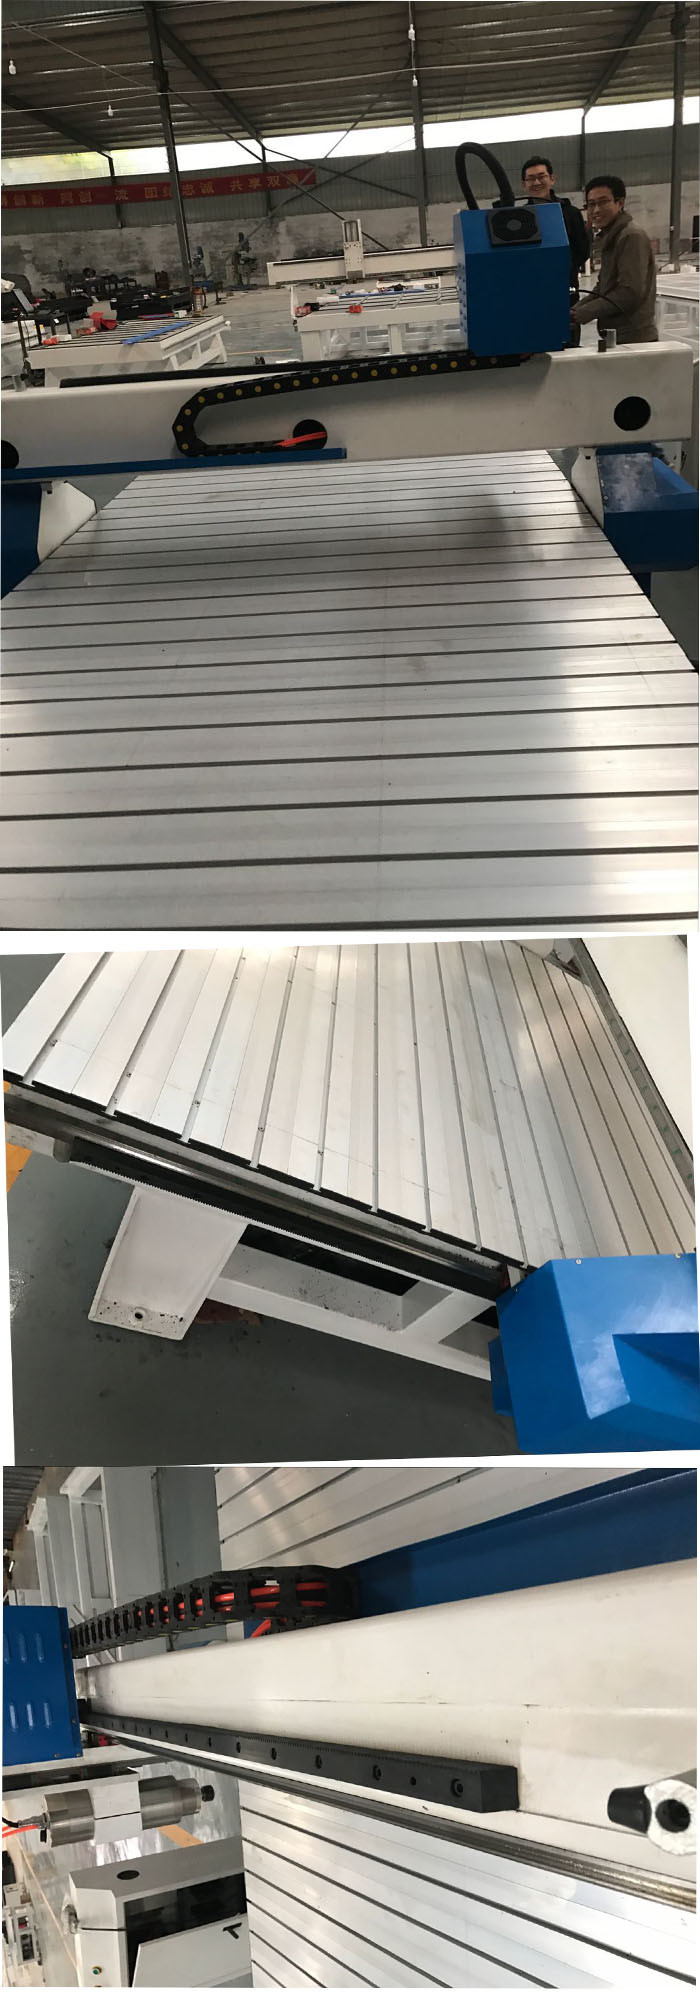 Ck1325 Aluminium Acrylic Wood Cutting Engraving Machine